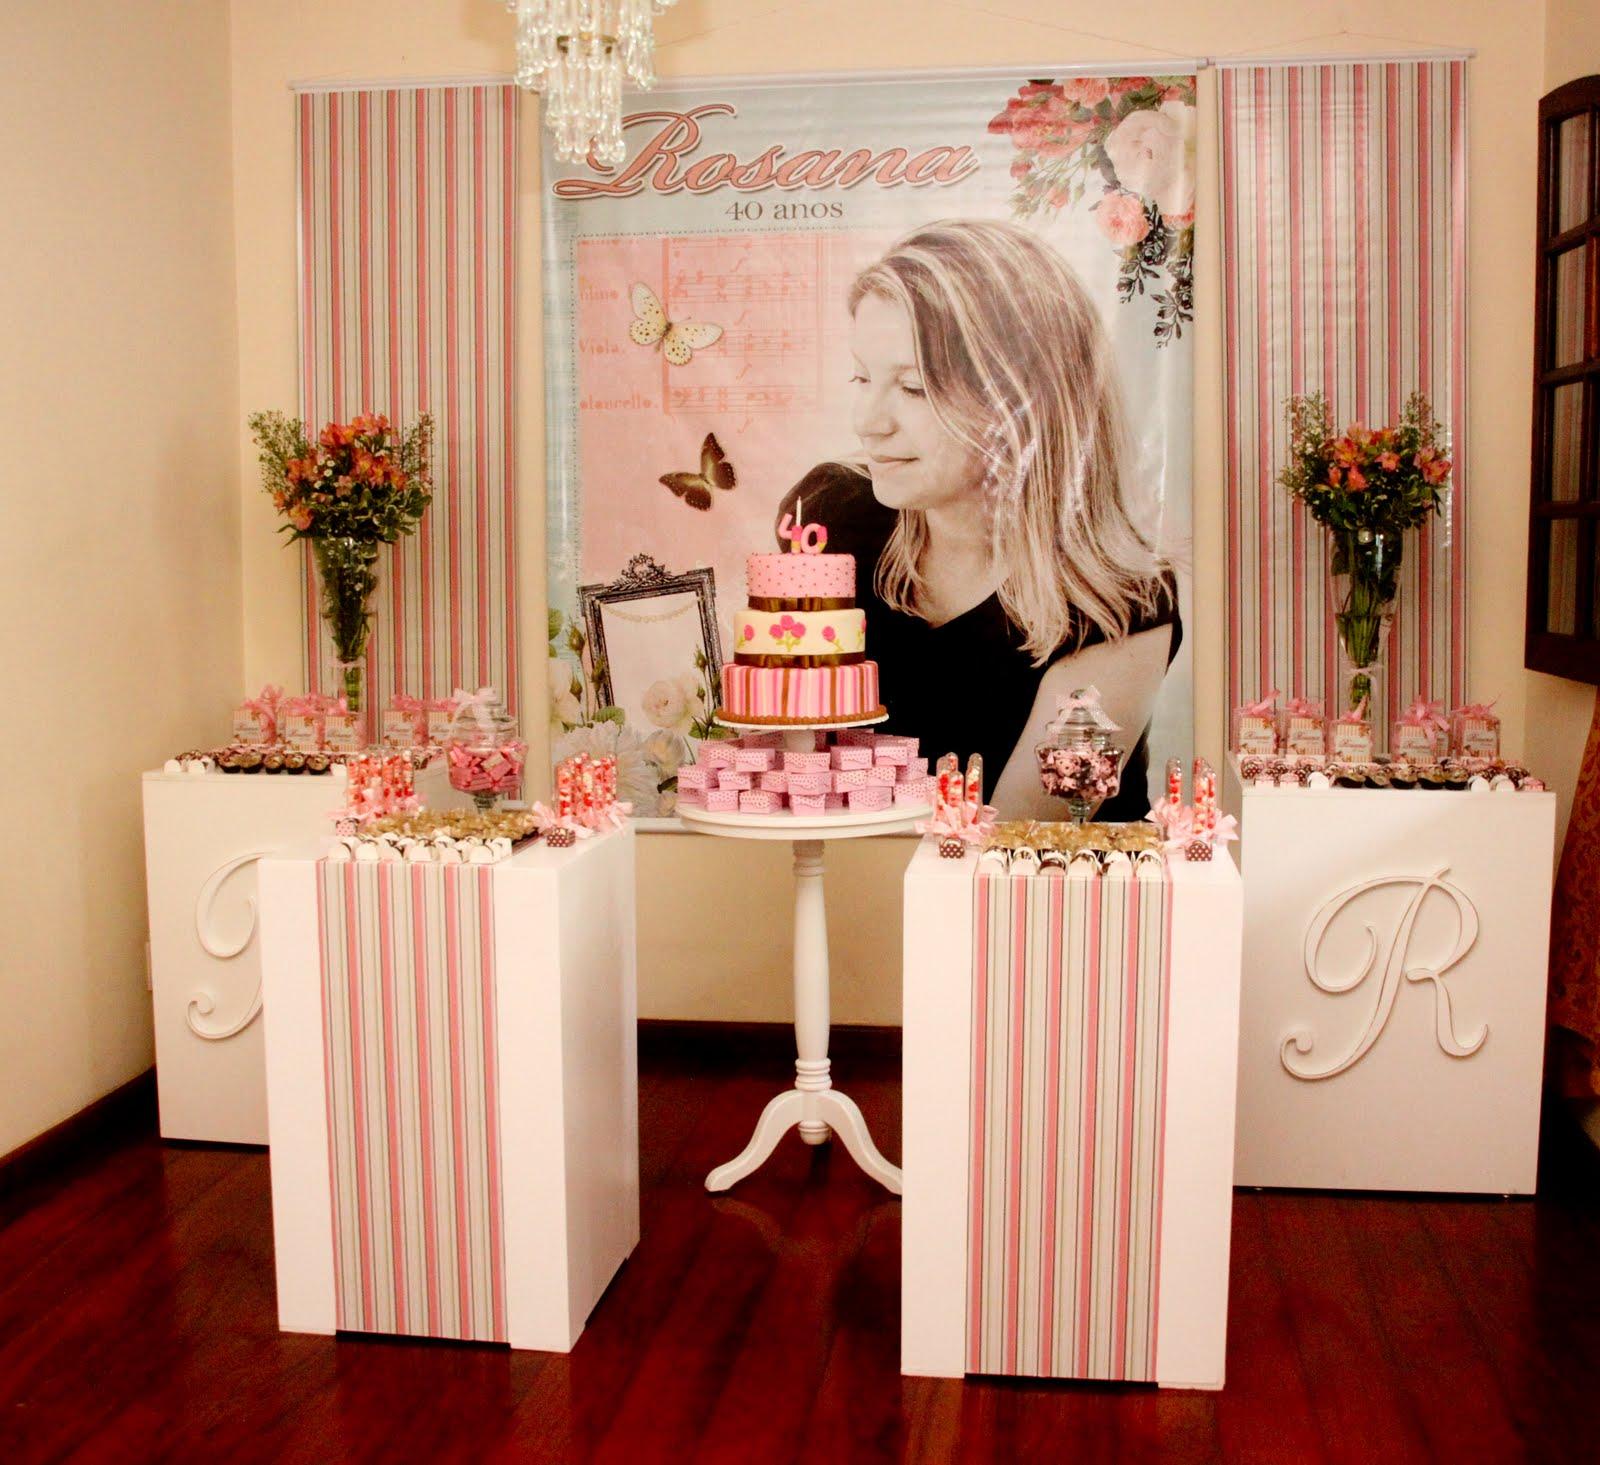 Festa de Aniversario de 40 Anos Feminino Festa de 40 Anos da Rosana